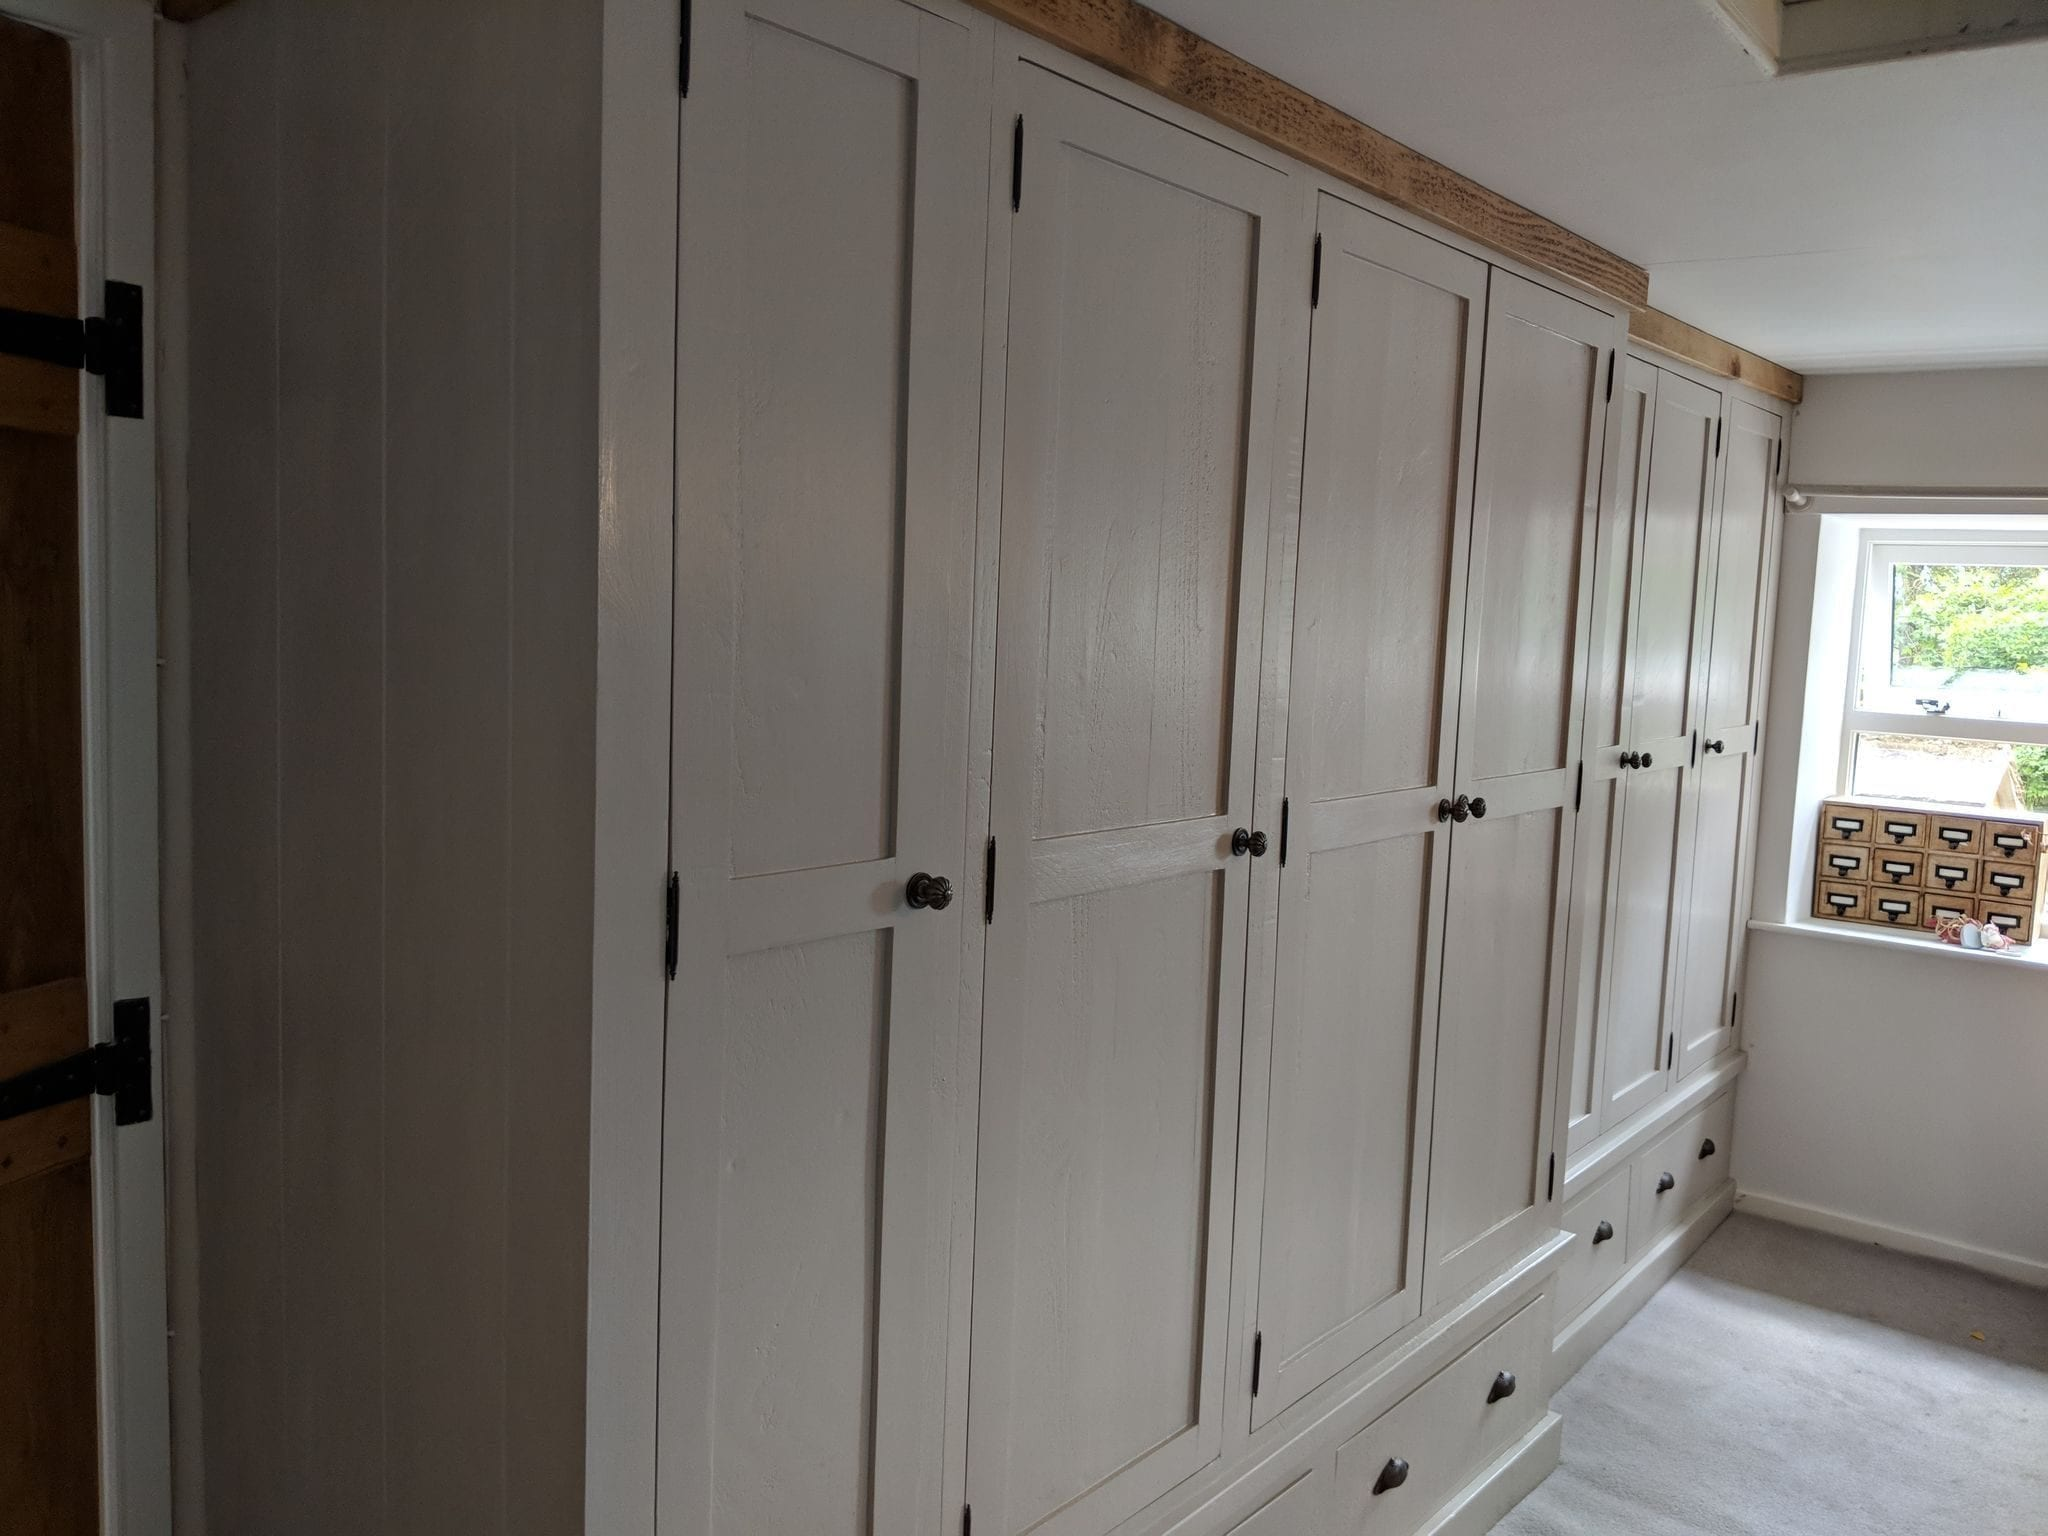 Light Grey Bespoke fitted wardrobes fit by Rural Interiors in Scissett, Huddersfield